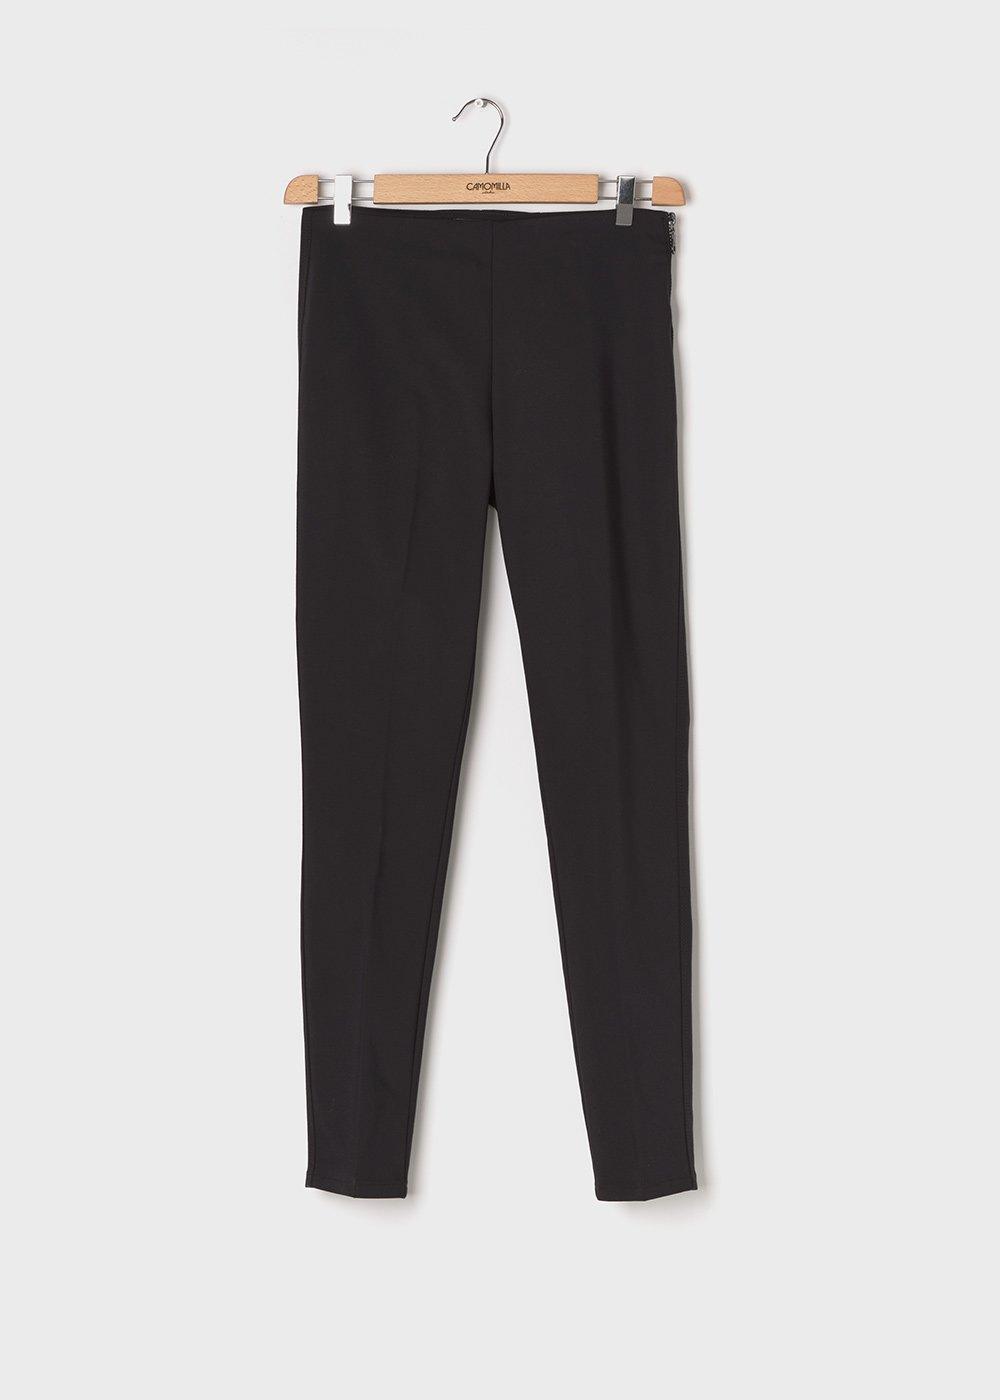 Claudia C model trousers - Black - Woman